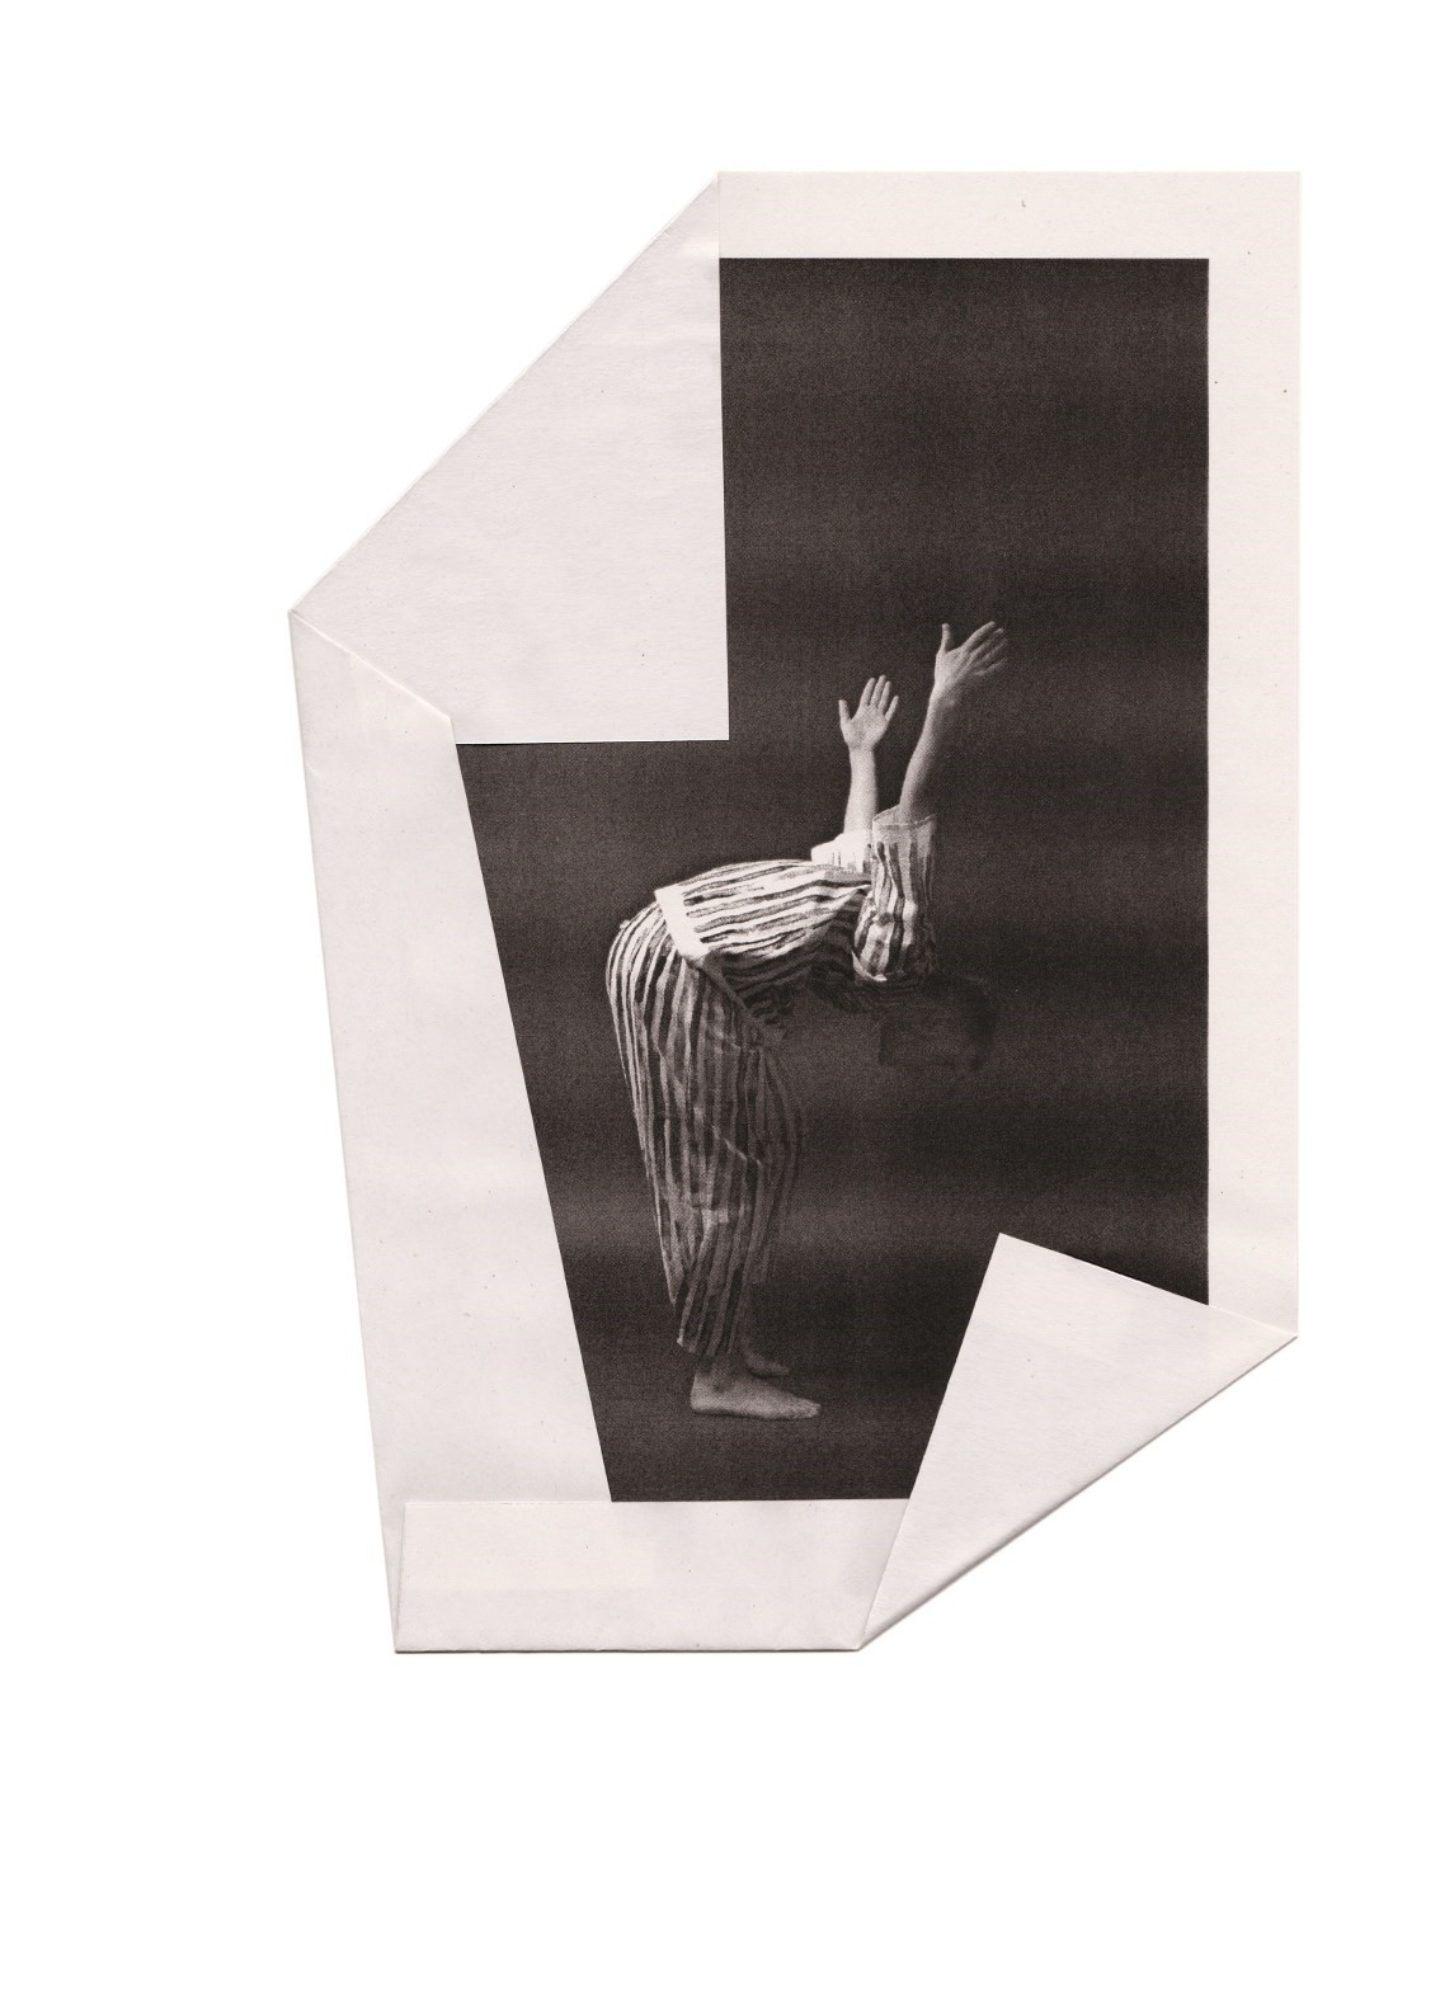 IGNANT-Art-Paul-Phung-Bruce-Usher-Dance-2